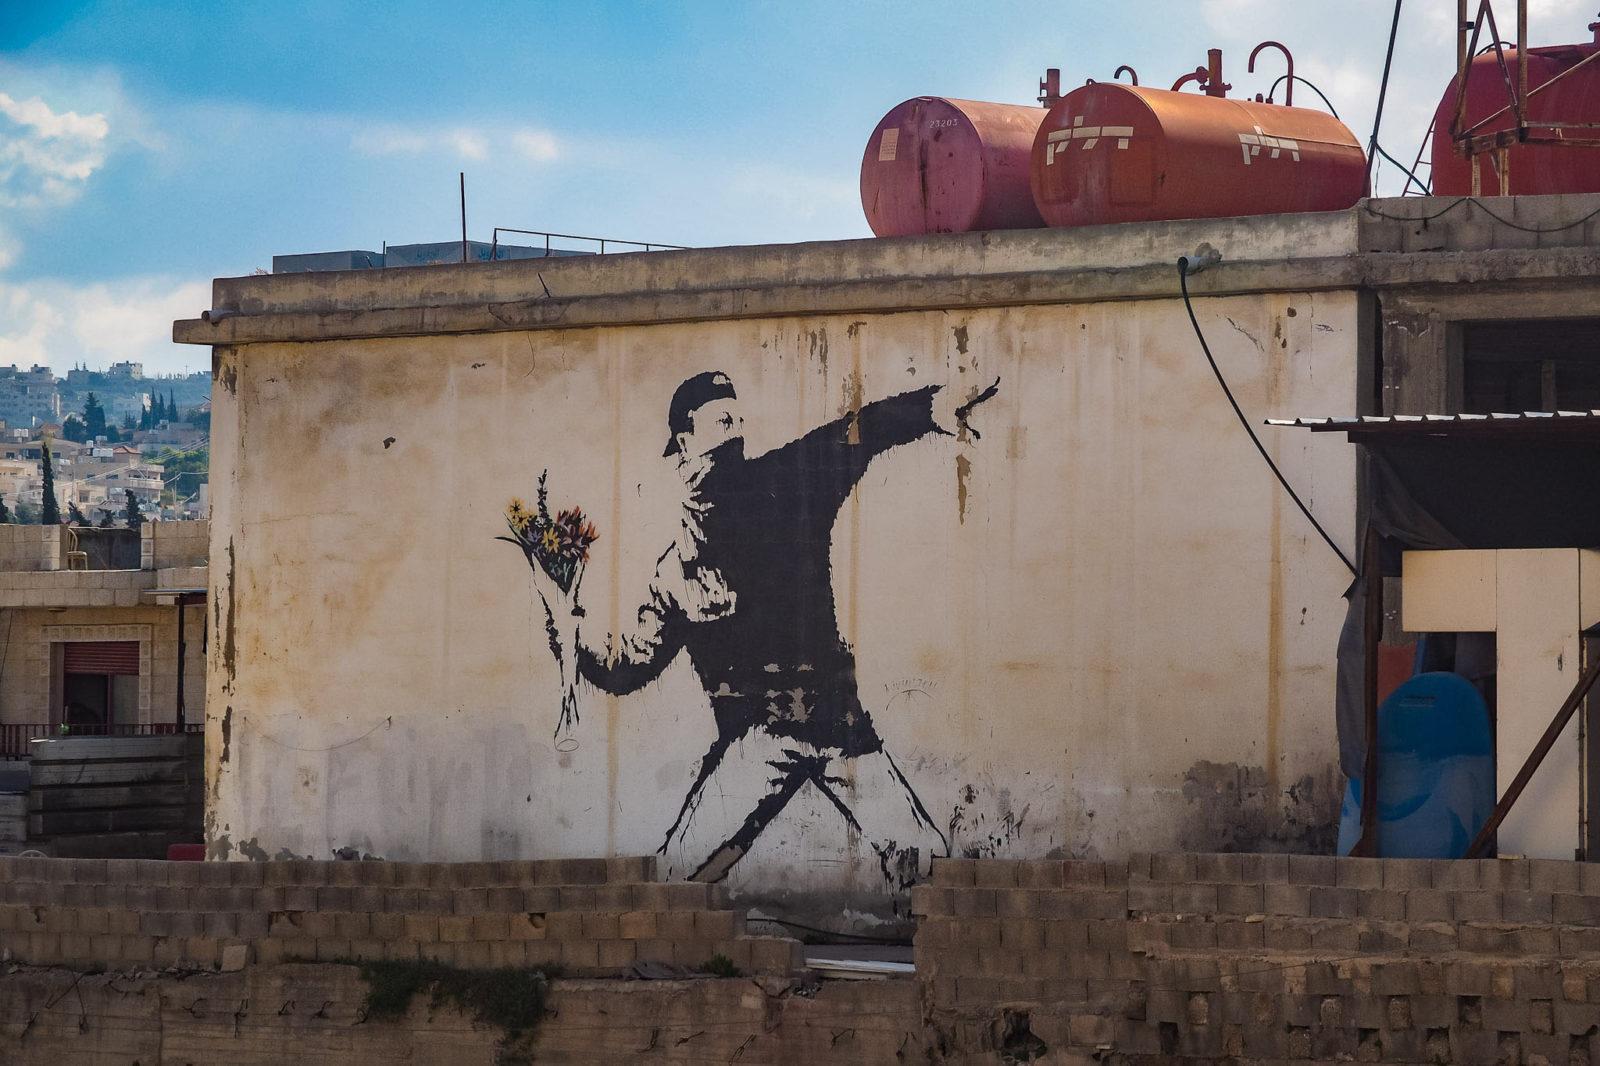 Banks'i Graffiti, Bethlehem, West Bank